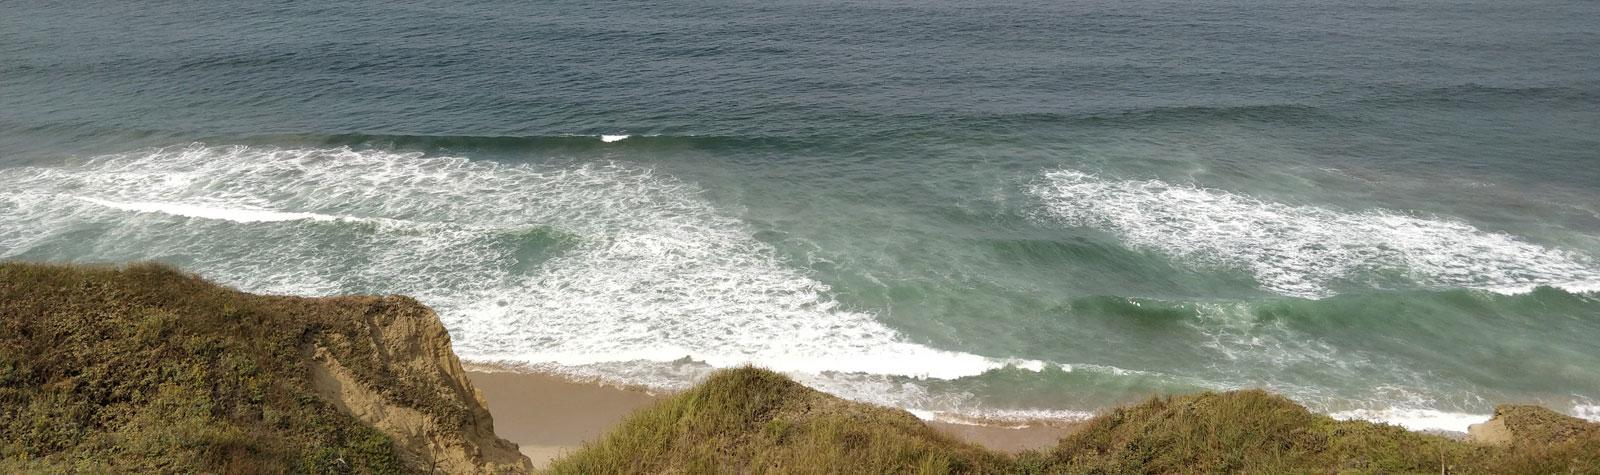 Day 35 – Butano State Park to New Brighton State Beach